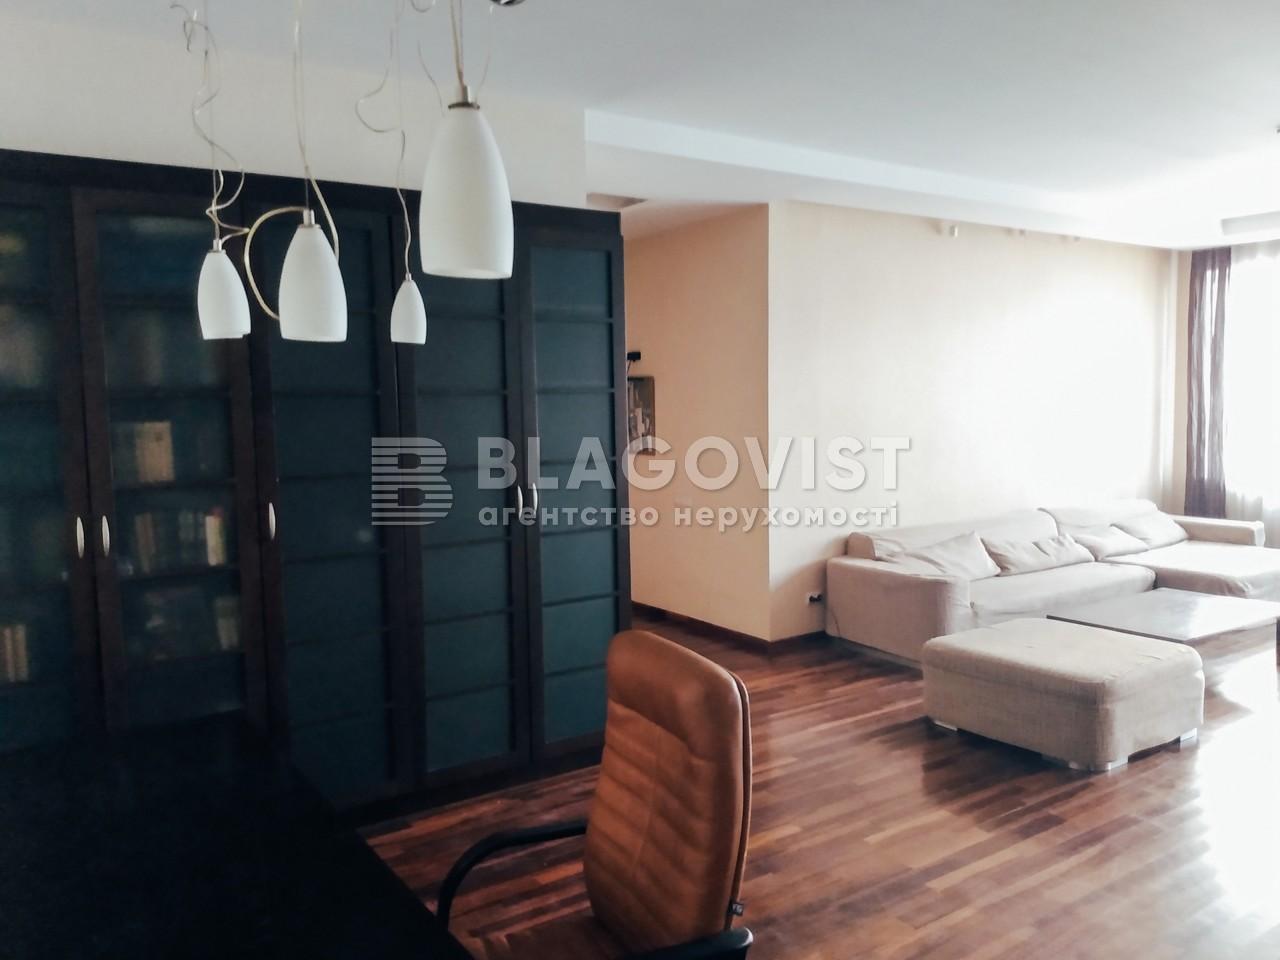 Квартира R-16873, Павловская, 17, Киев - Фото 29